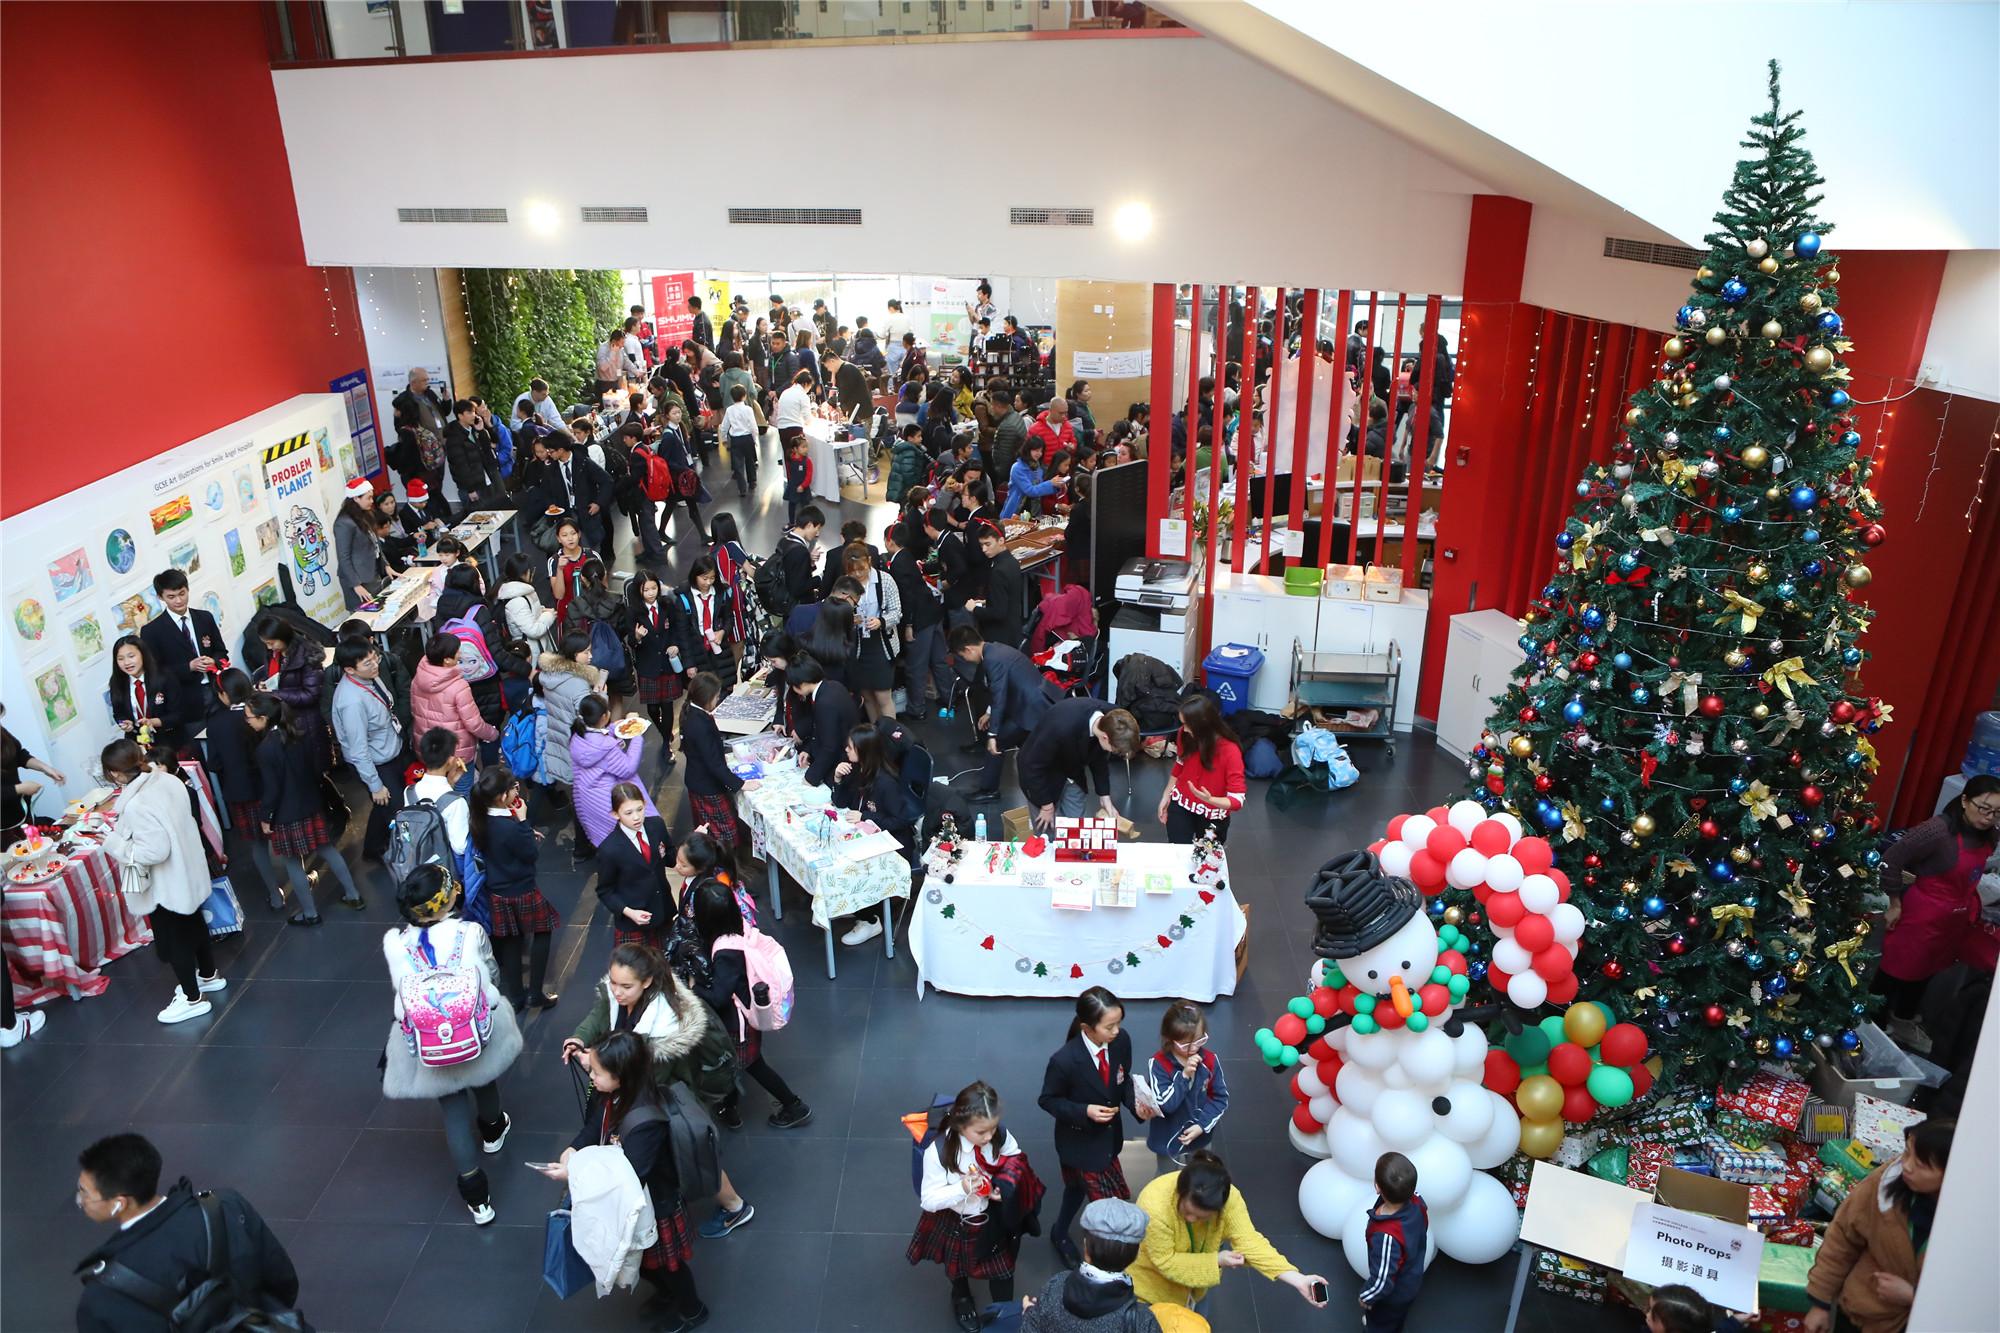 Dulwich Christmas Bazaar